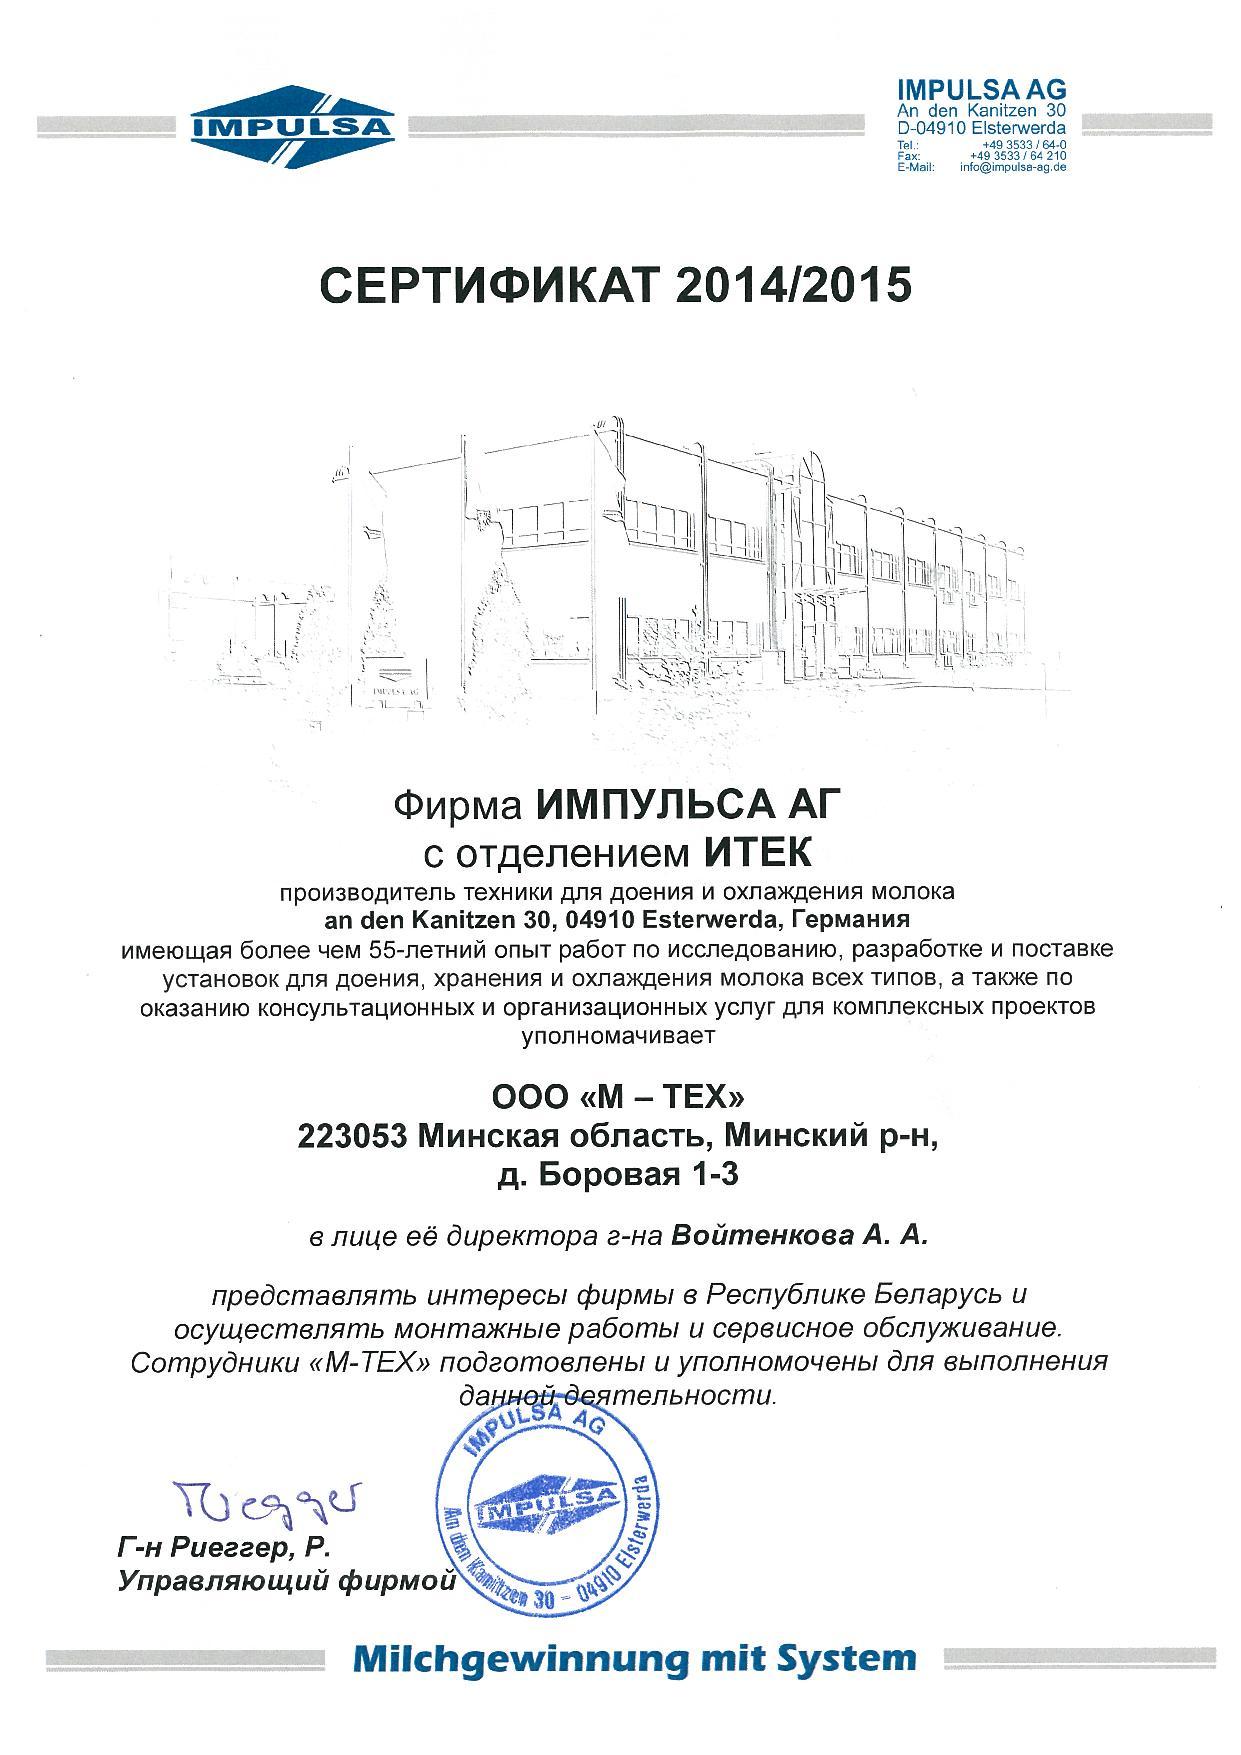 Сертификат Impulsa RU